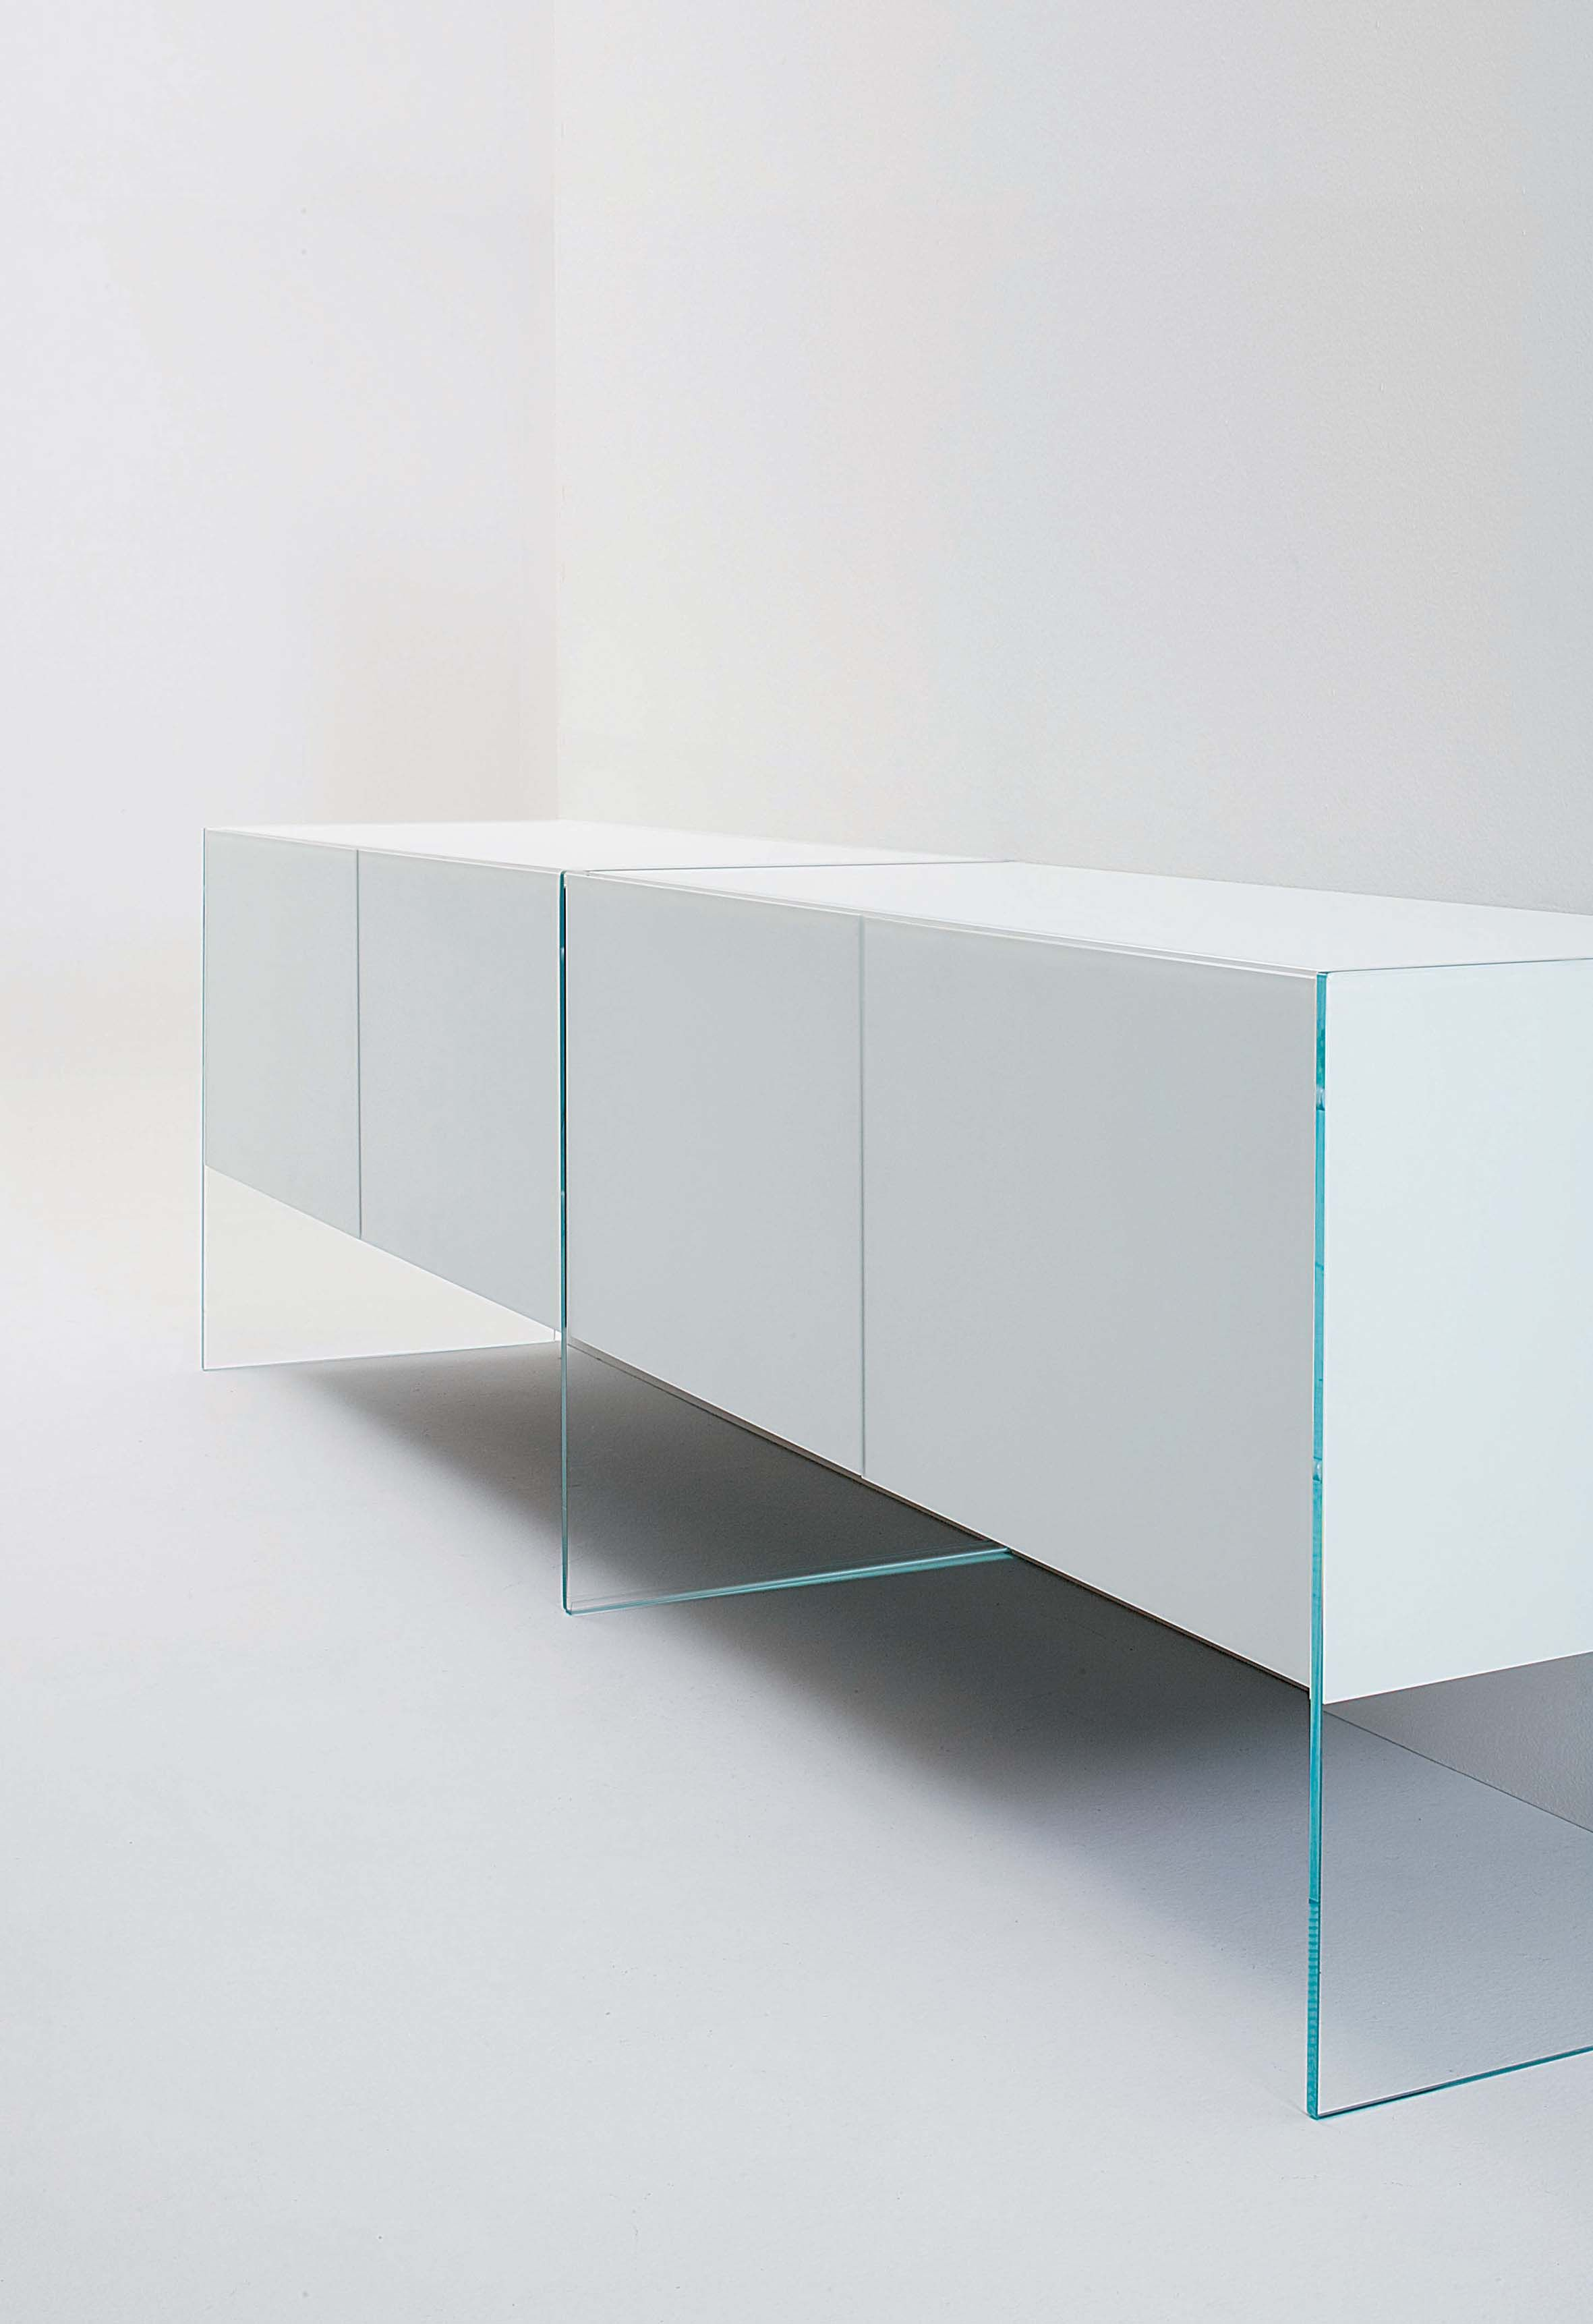 Gallotti radice air unit furniture sleek storage